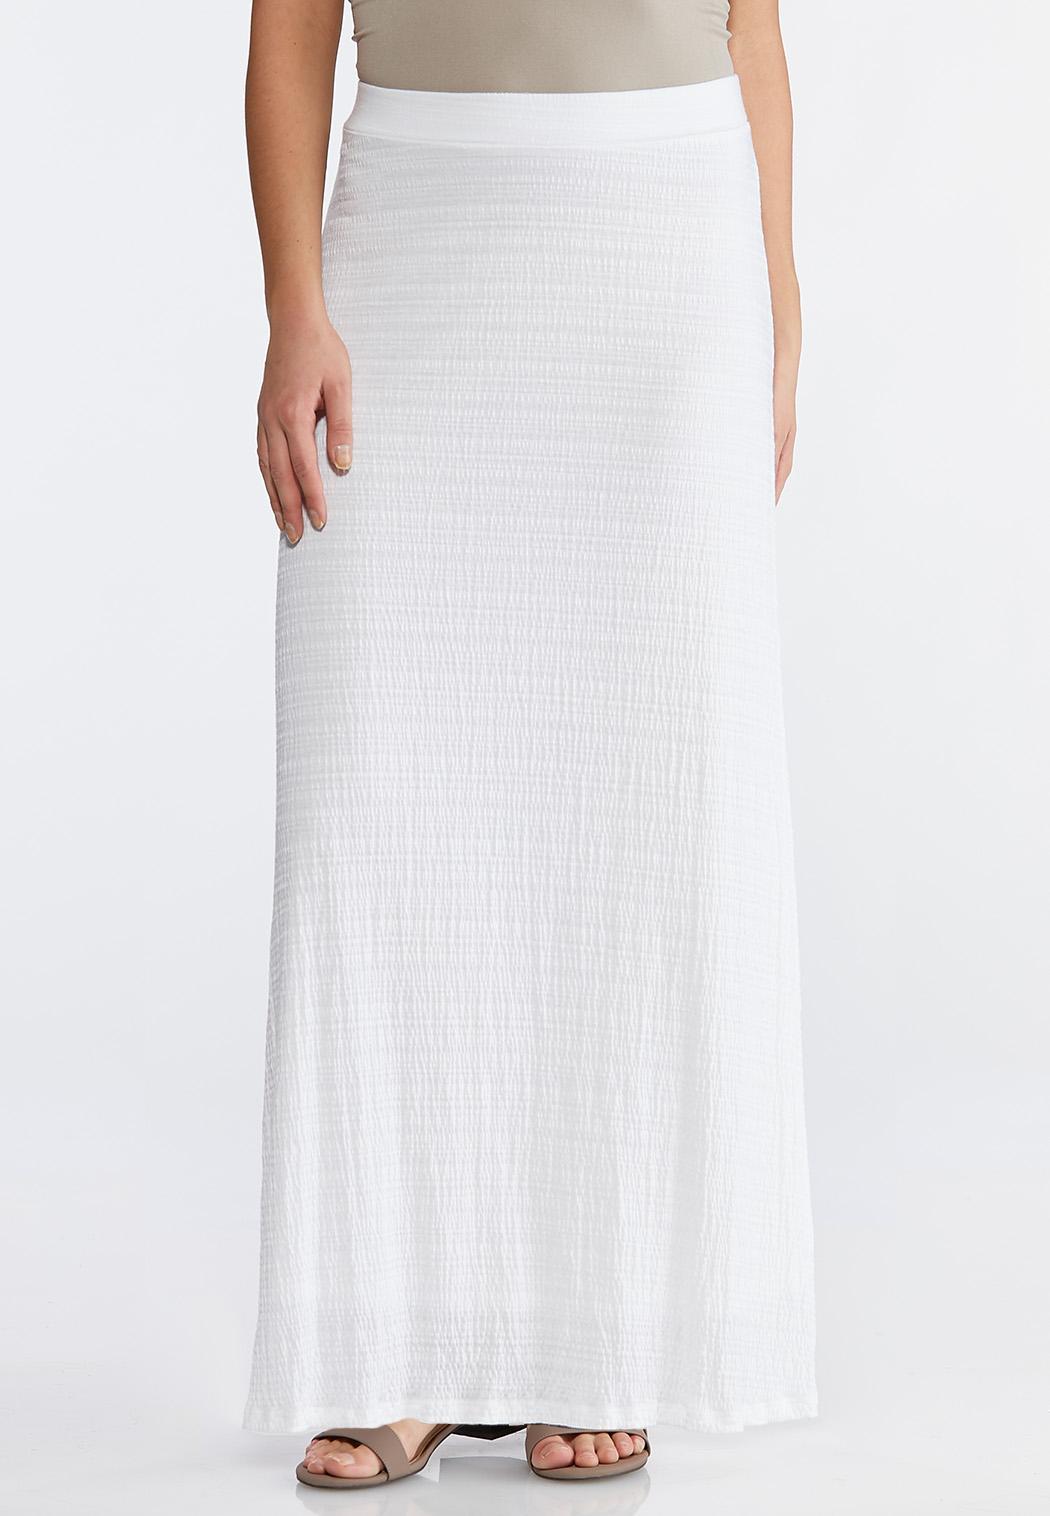 Slub Knit Maxi Skirt